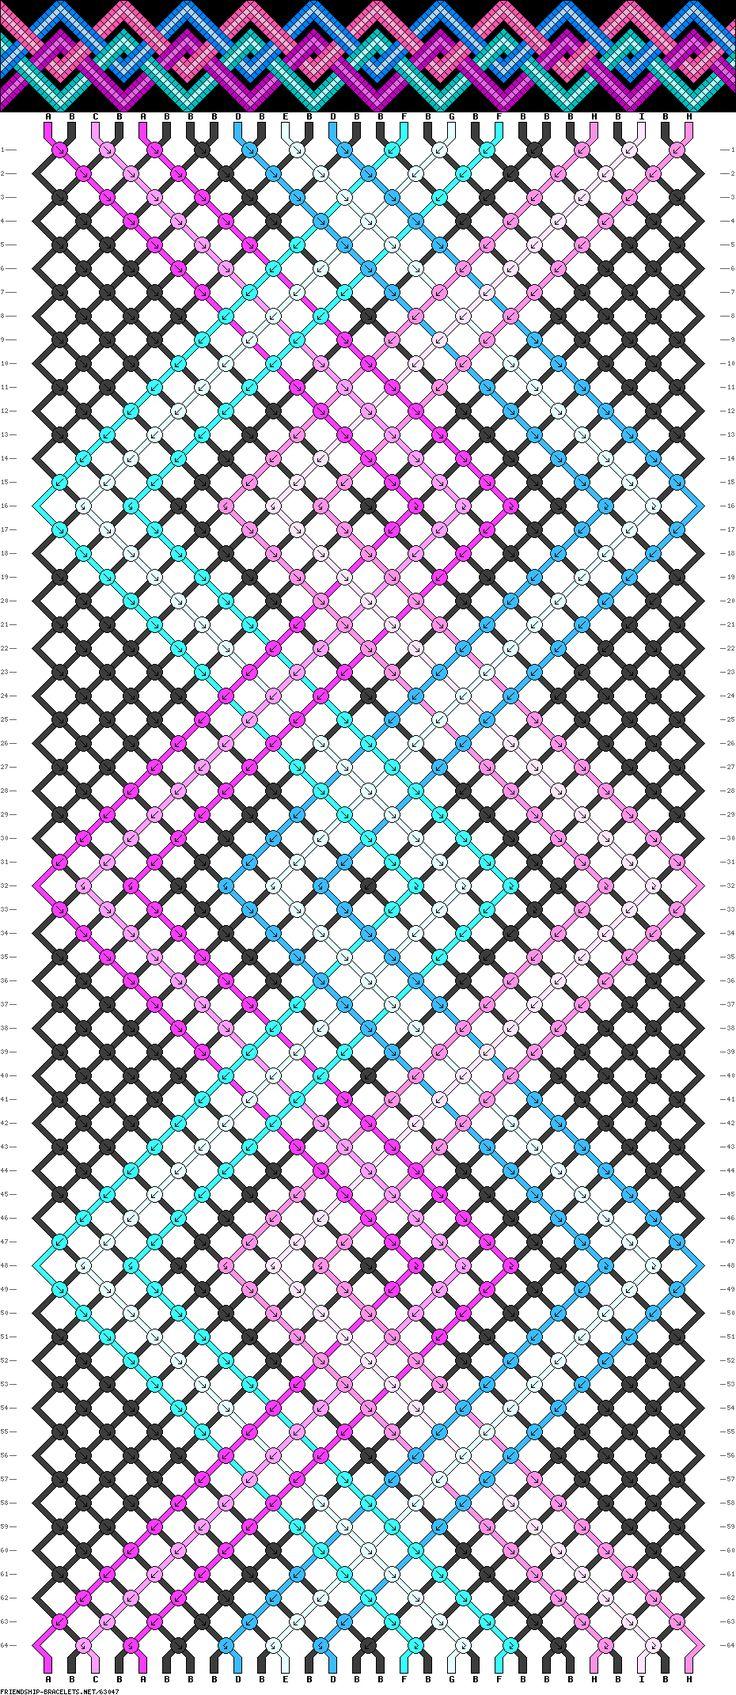 friendship bracelet pattern ● 28 strings ● 9 colors ● A(2), B(16), C(1), D(2), E(1), F(2), G(1), H(2), I(1)